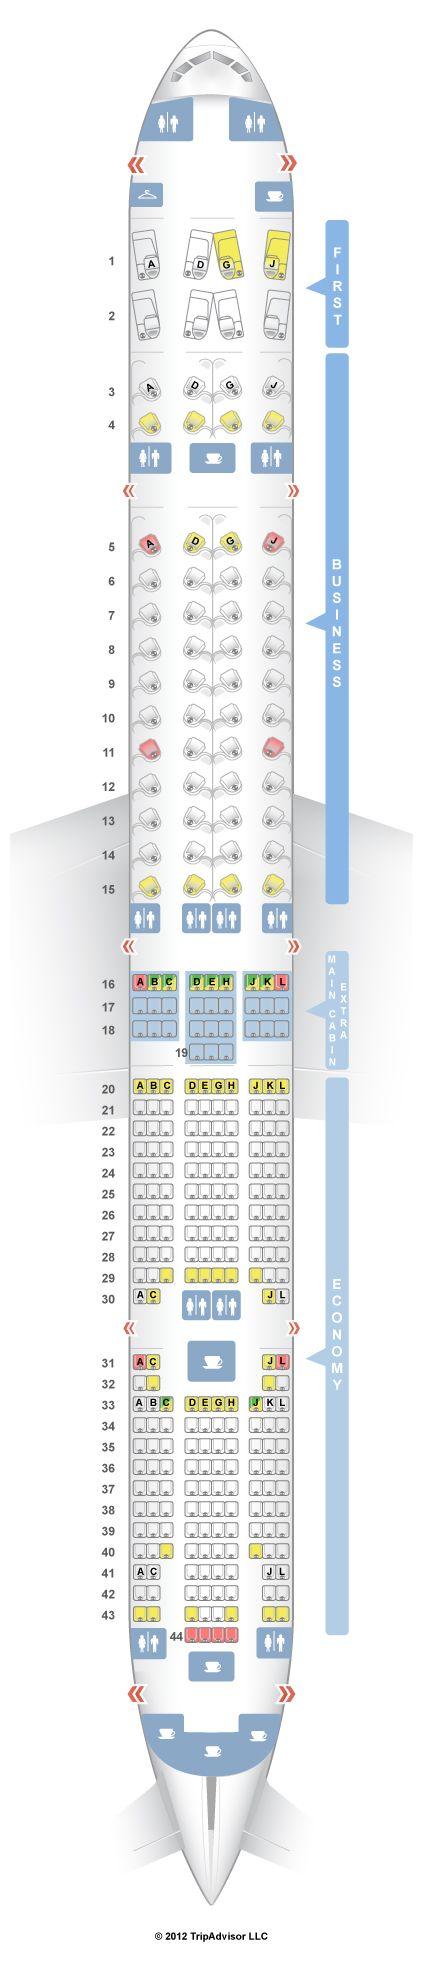 Seatguru seat map american airlines boeing er  also london rh pinterest